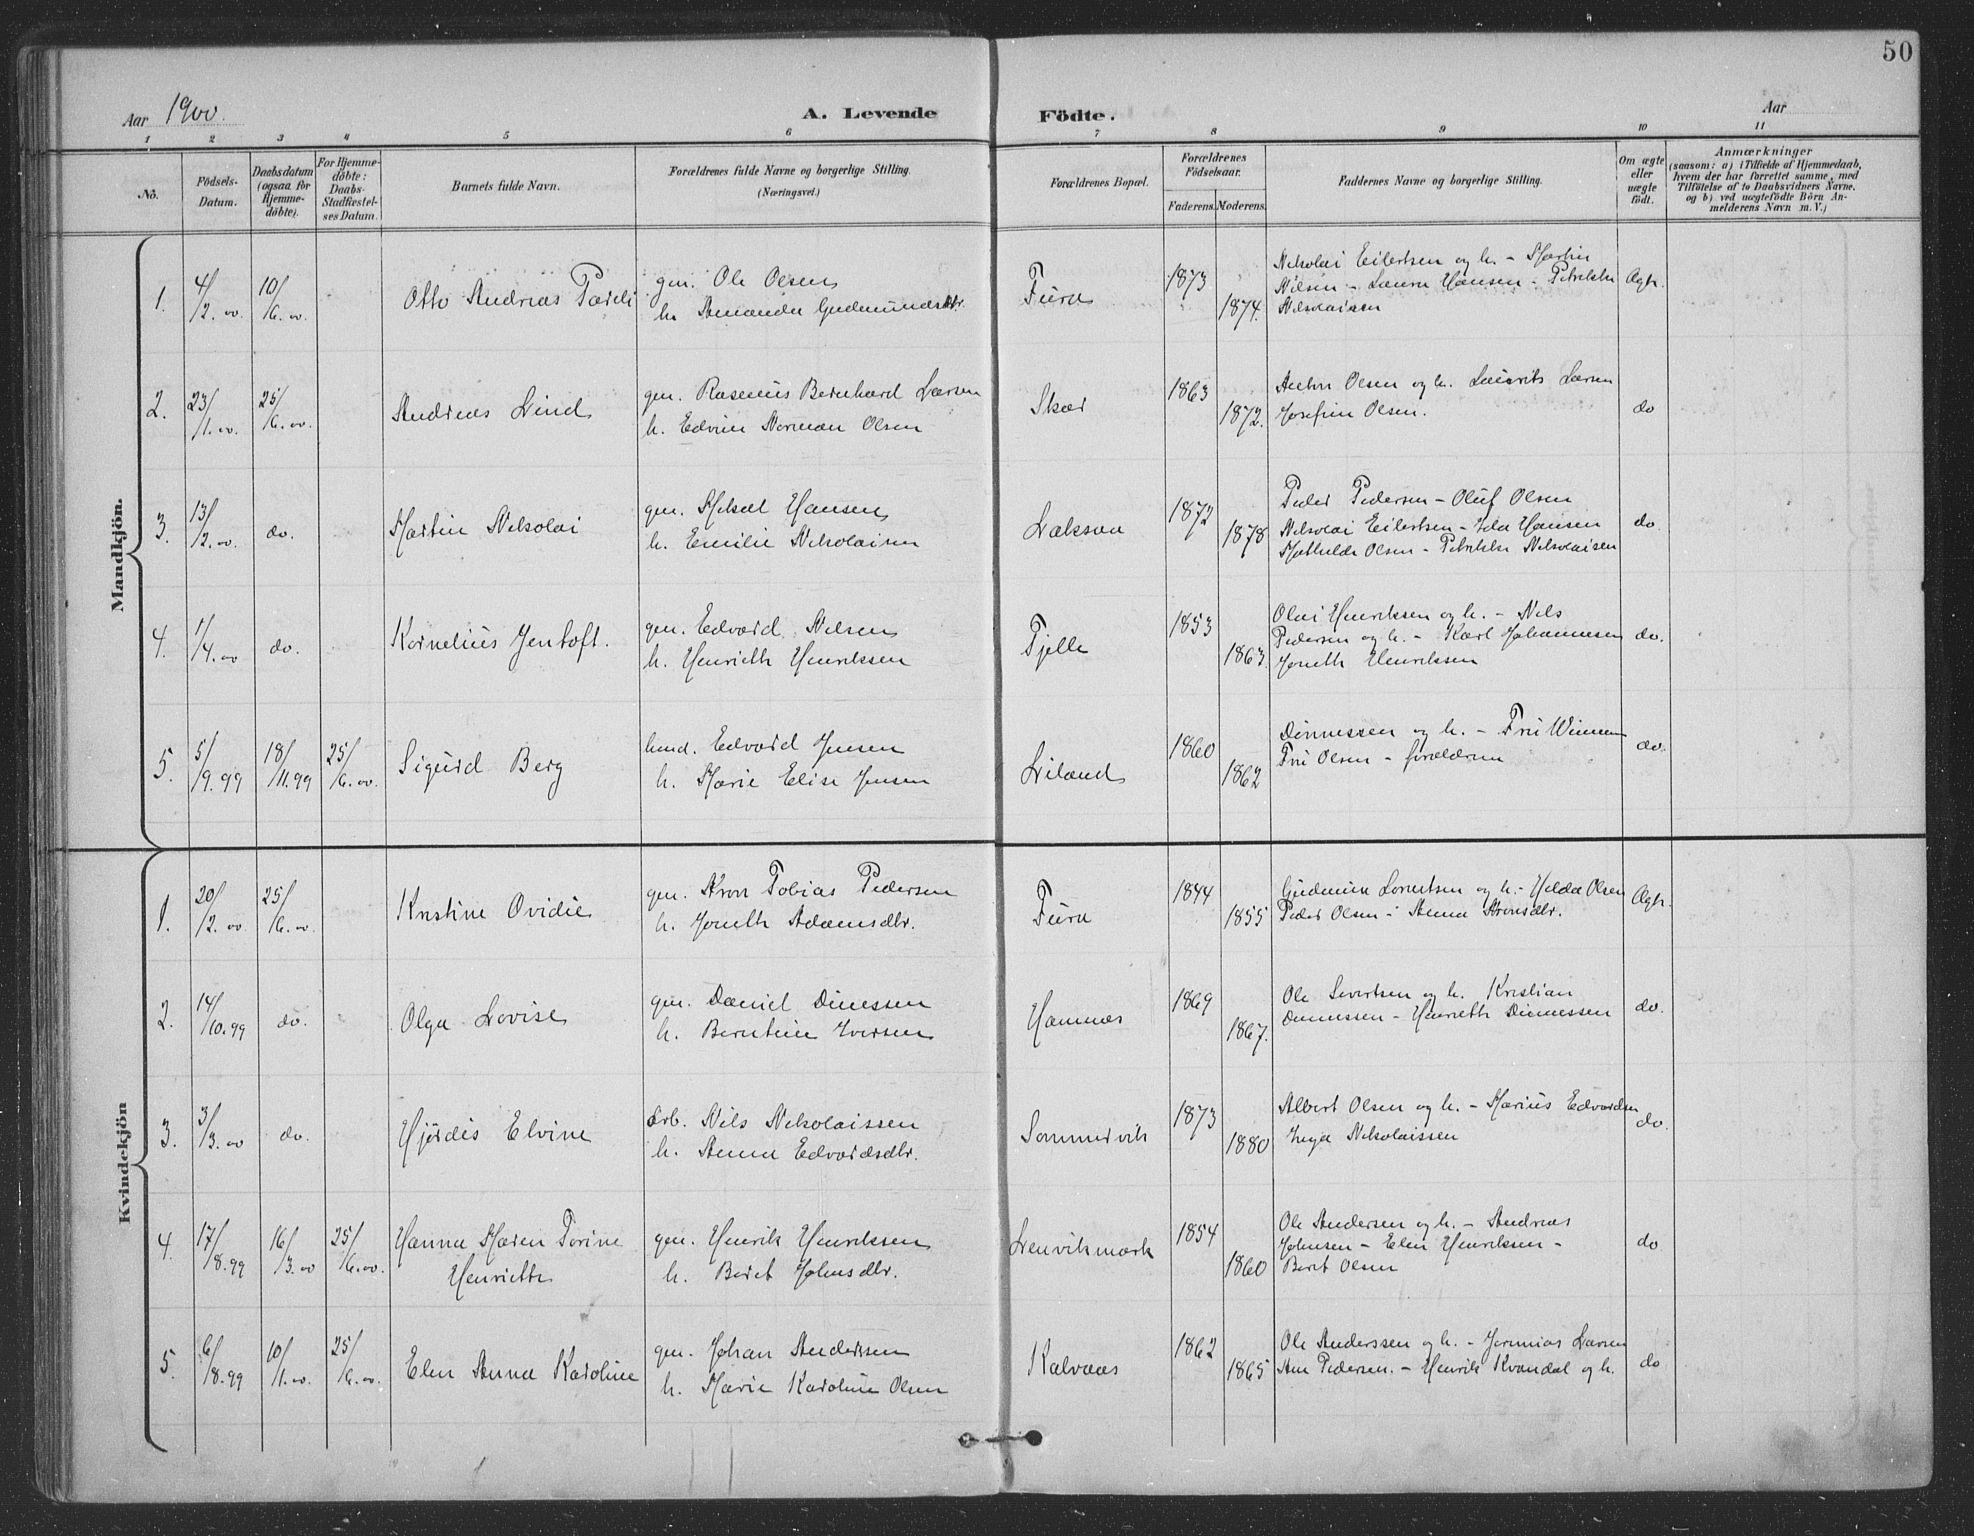 SAT, Ministerialprotokoller, klokkerbøker og fødselsregistre - Nordland, 863/L0899: Ministerialbok nr. 863A11, 1897-1906, s. 50